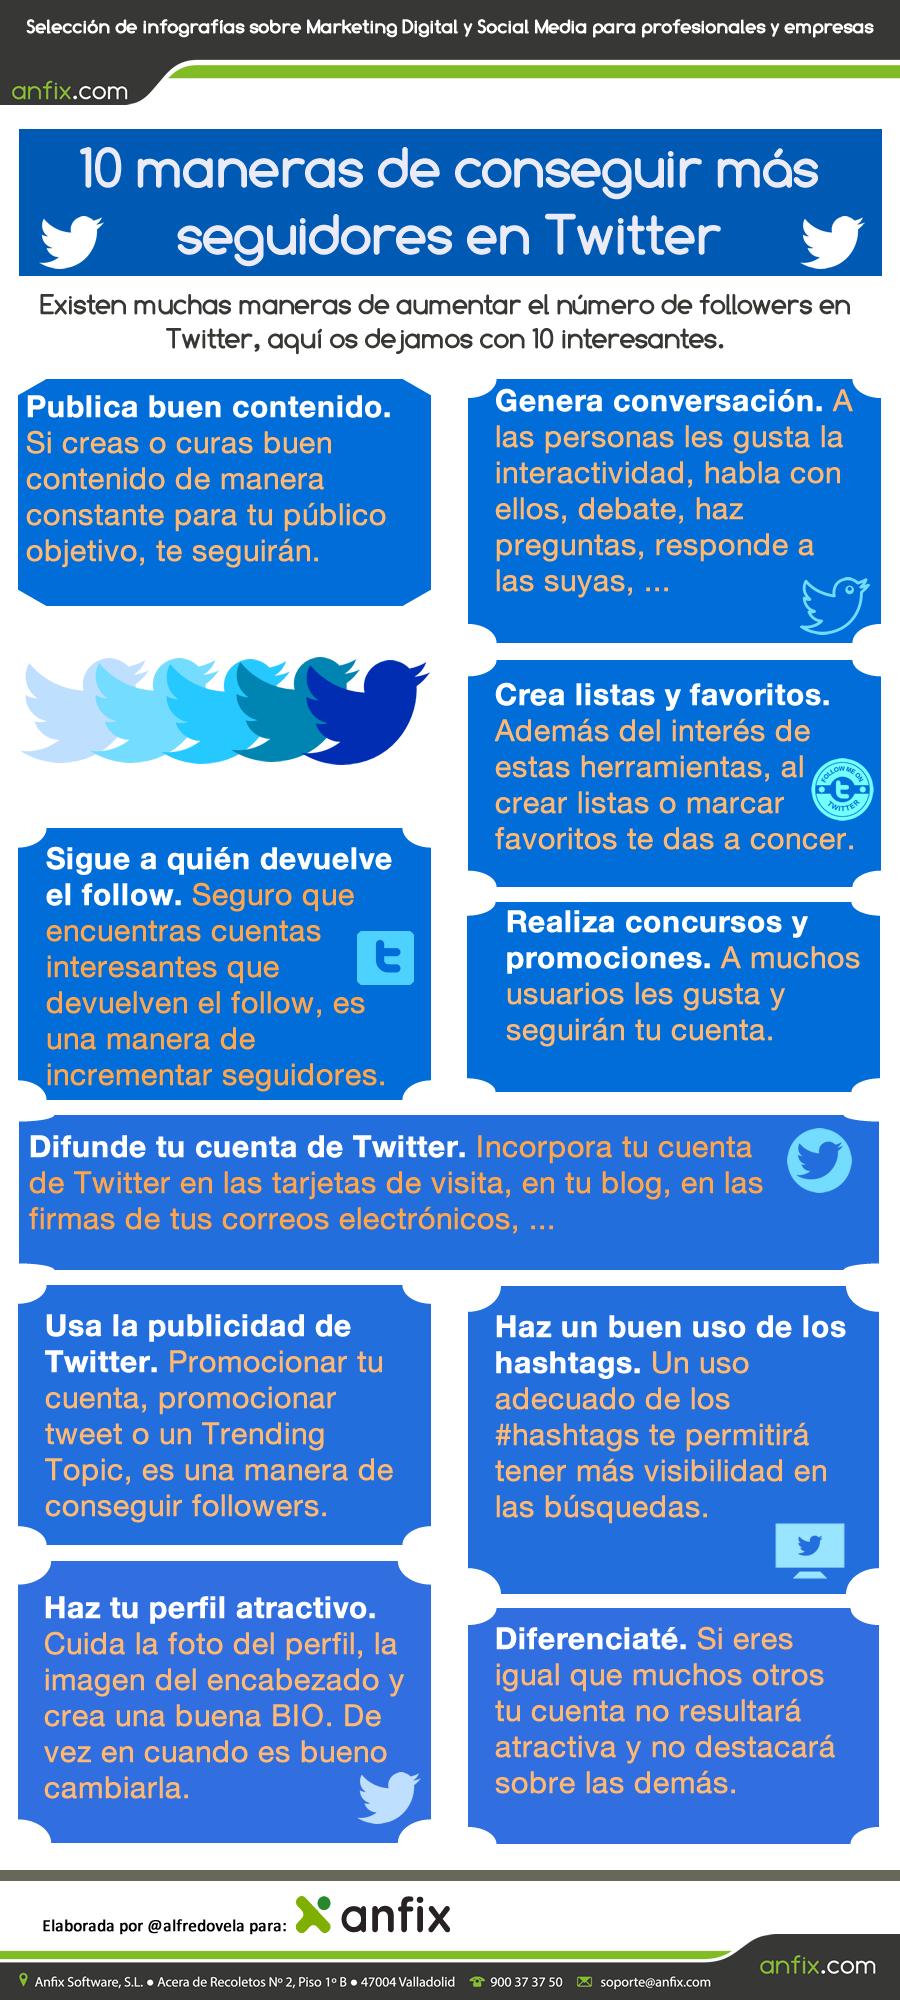 ganar seguidores en Twitter